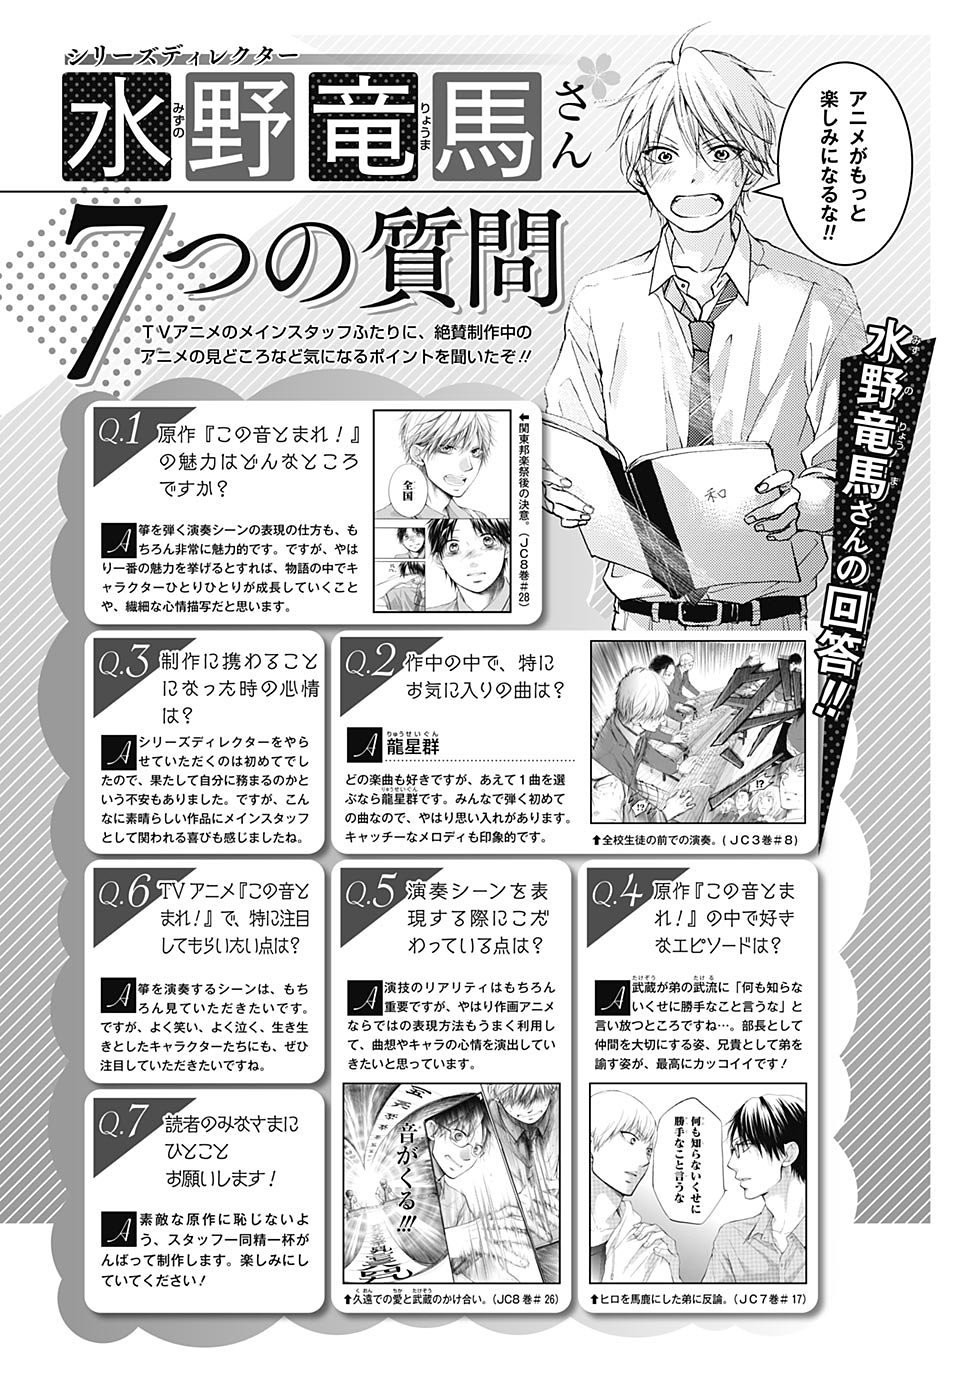 Kono Oto Tomare! - Chapter 073 - Page 43